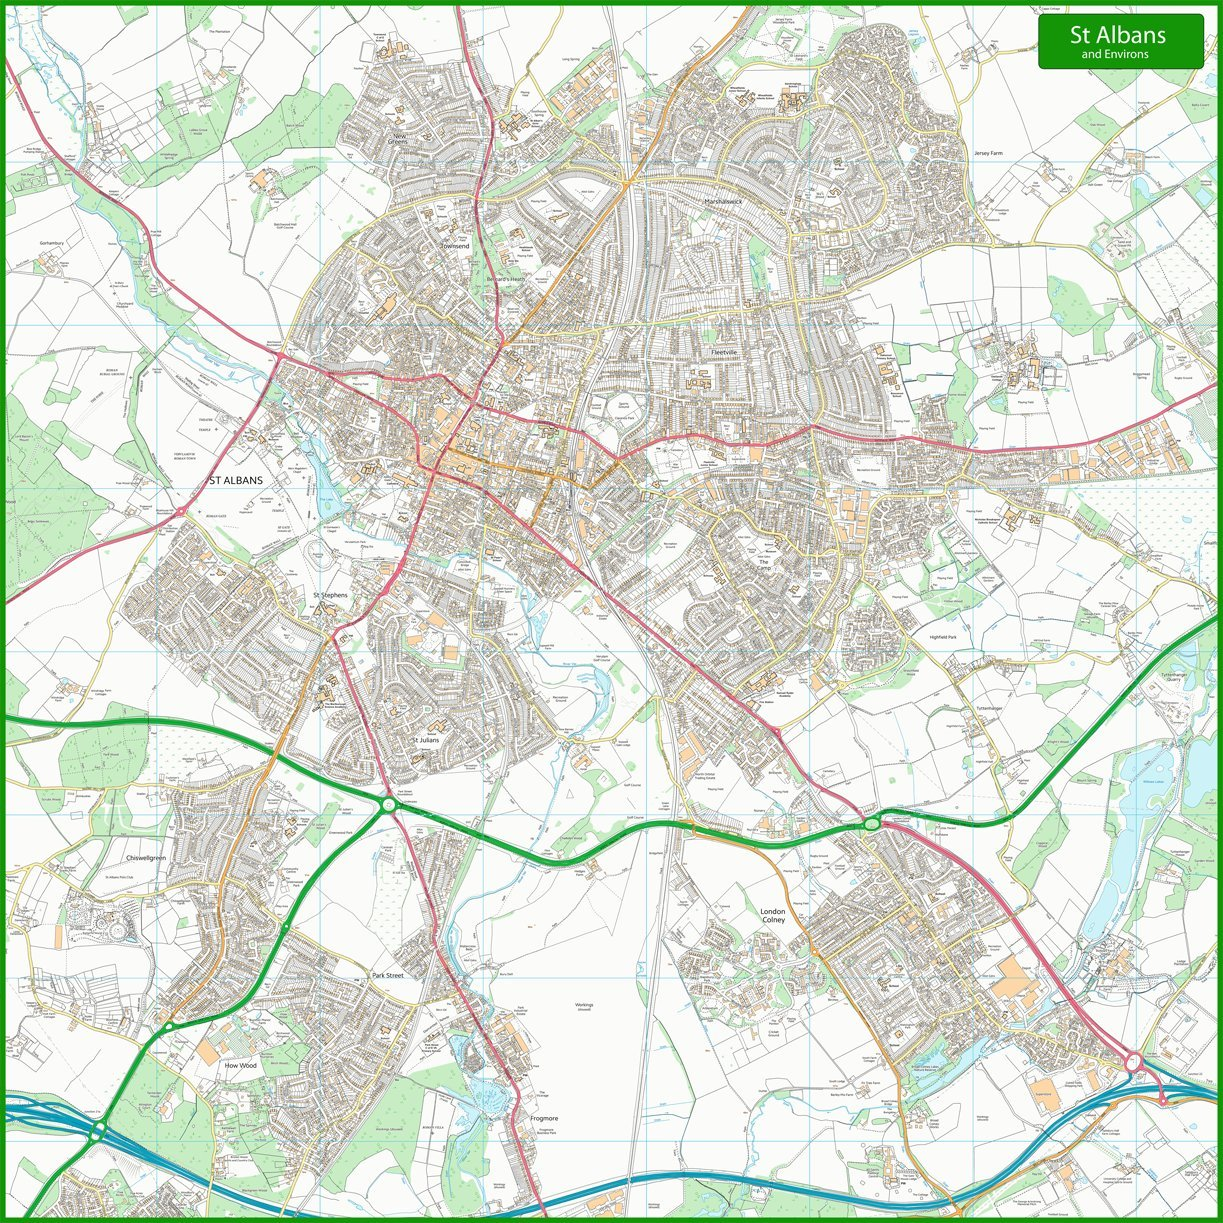 ST Albans calle mapa 125 – 125 x 125 mapa cm 066de7